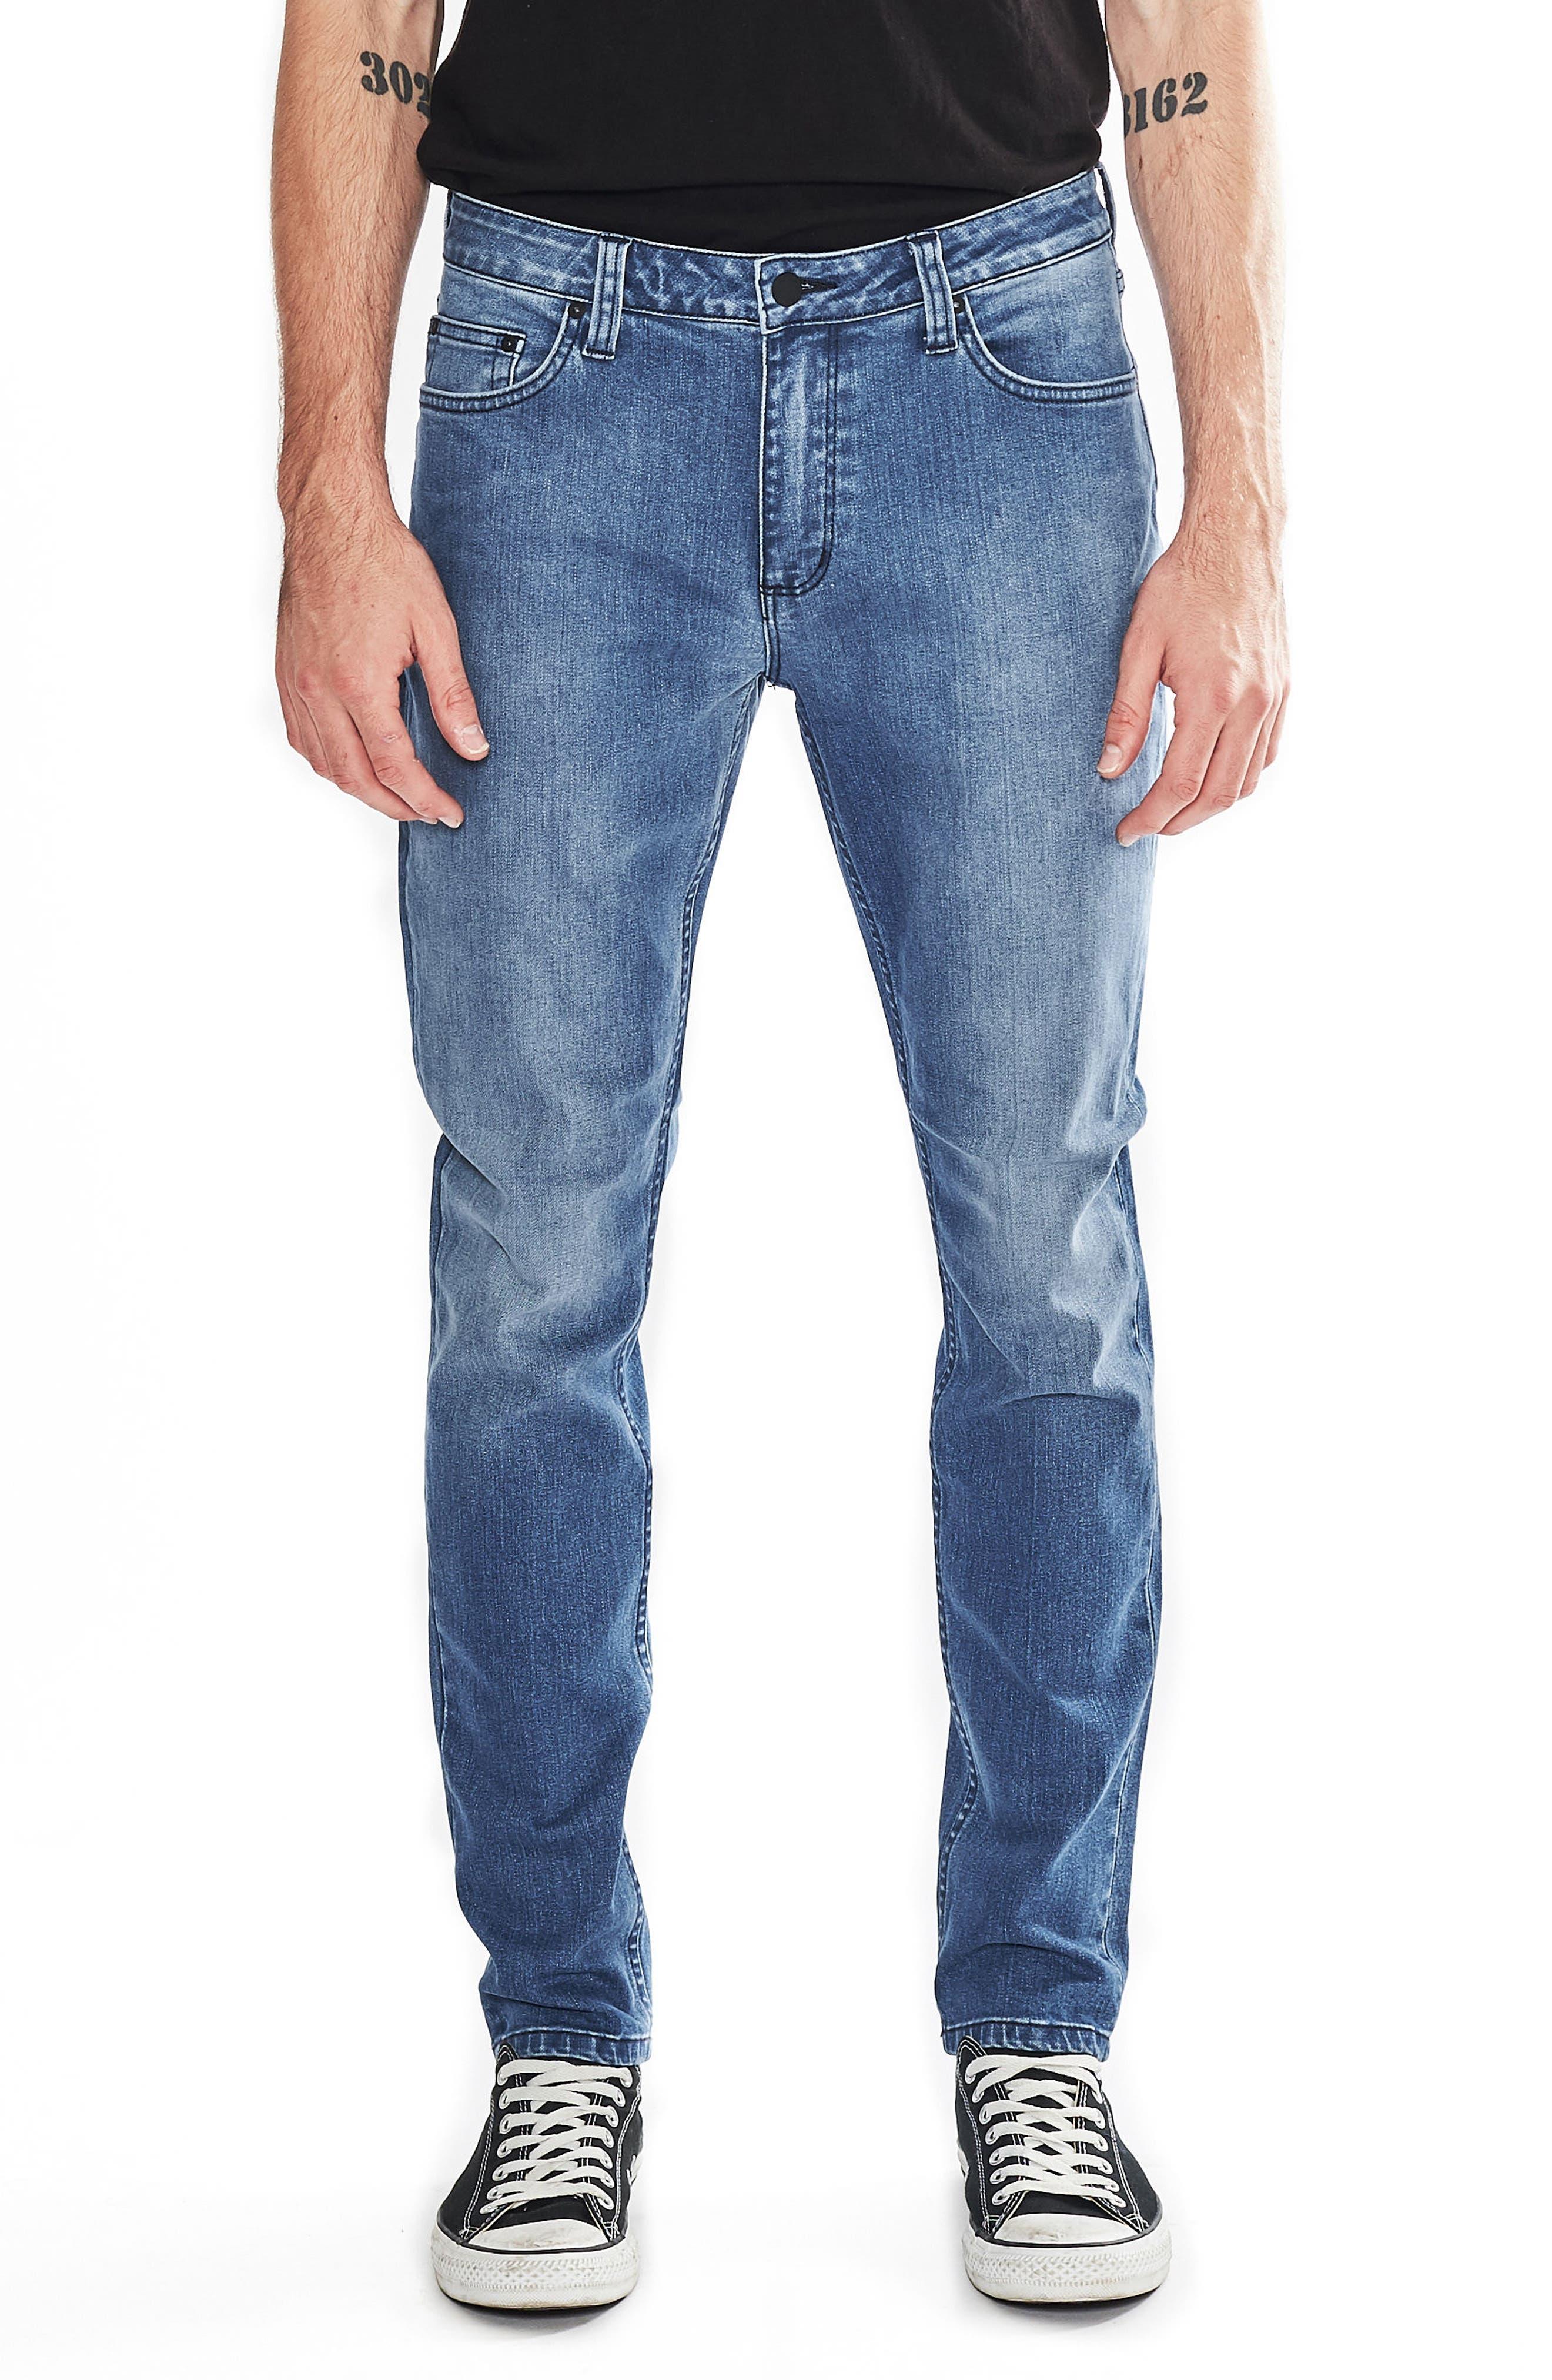 Tim Slims Slim Fit Jeans,                             Main thumbnail 1, color,                             Safety Beach Blue